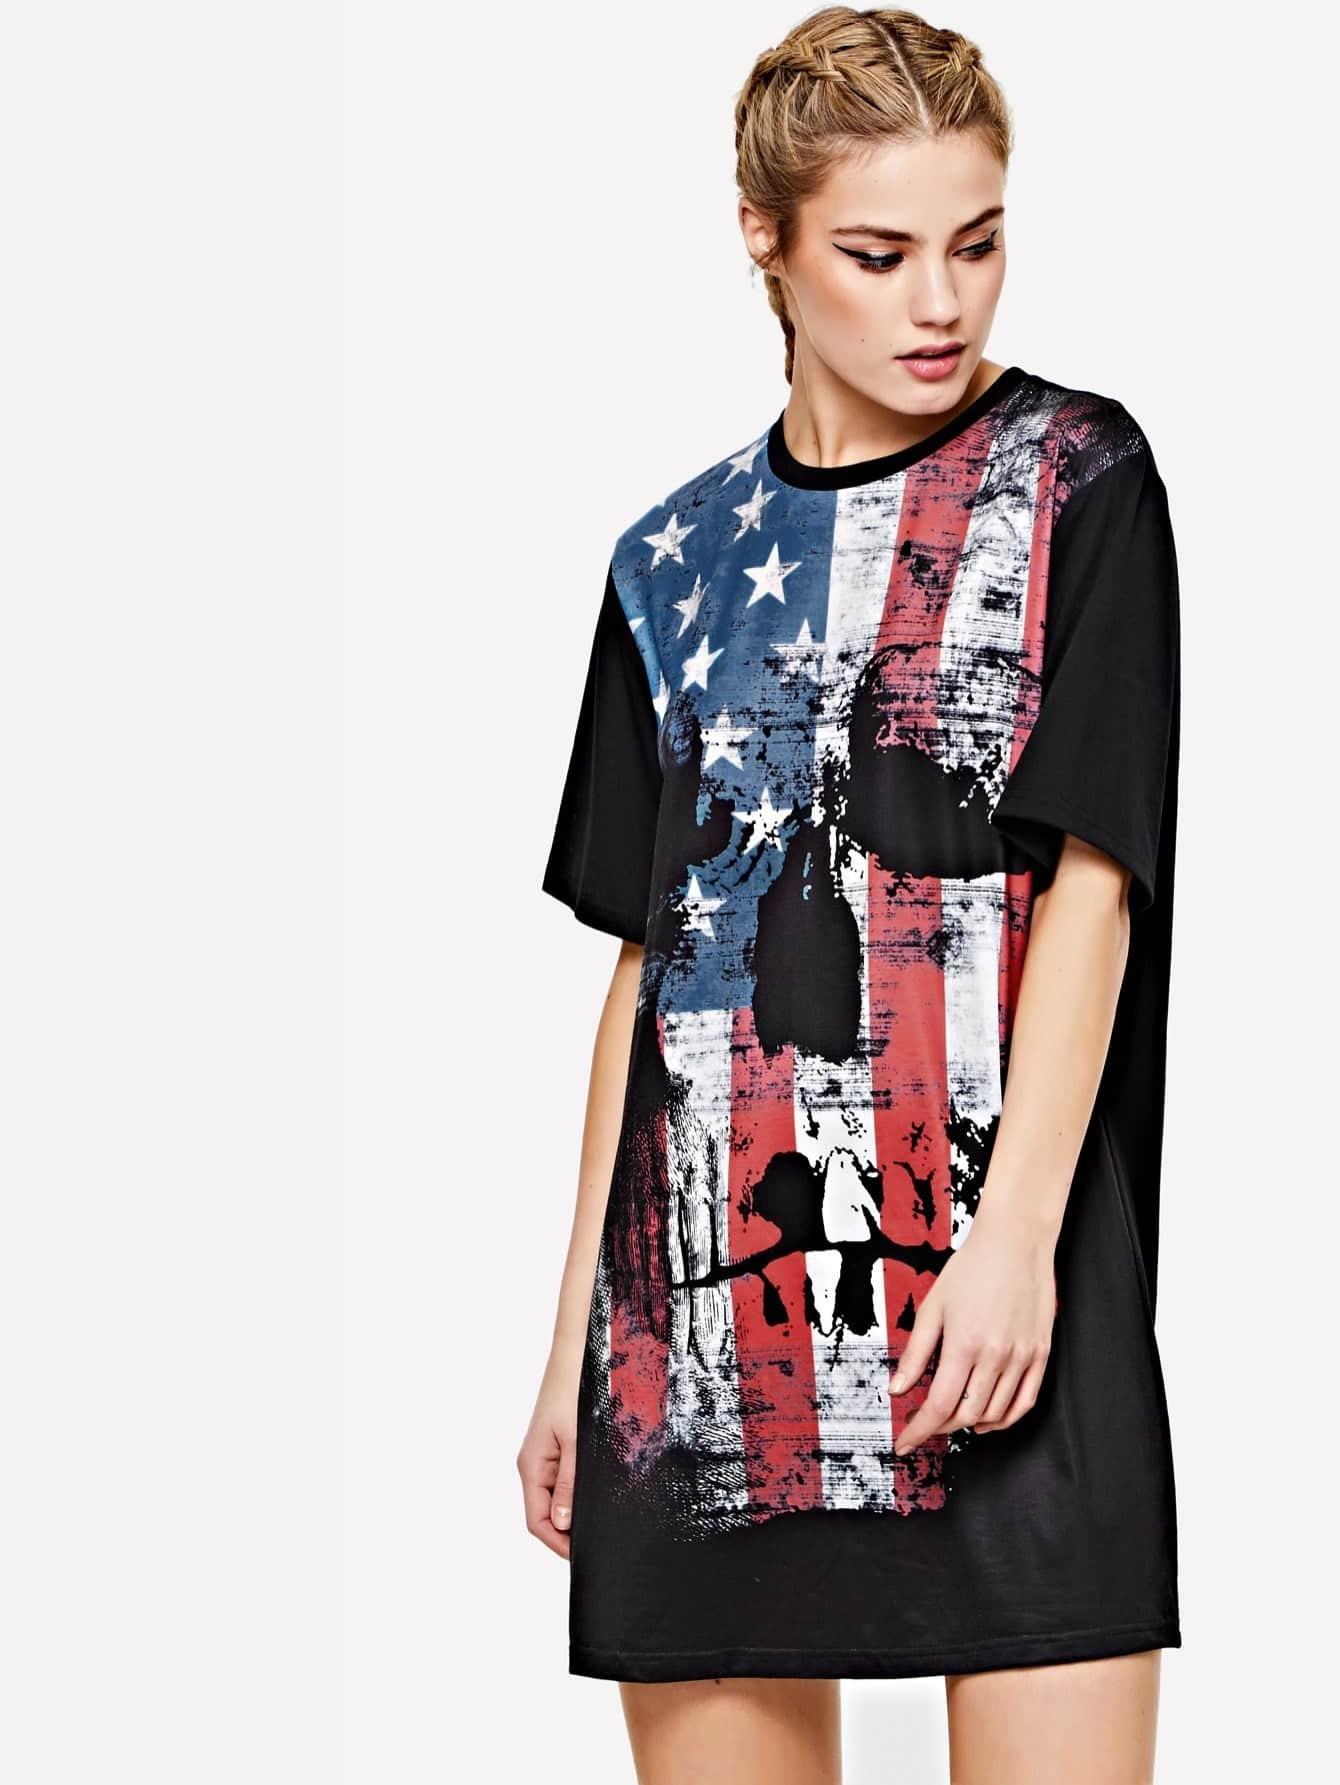 Distressed Graphic Print Dress christine darvin new ego men